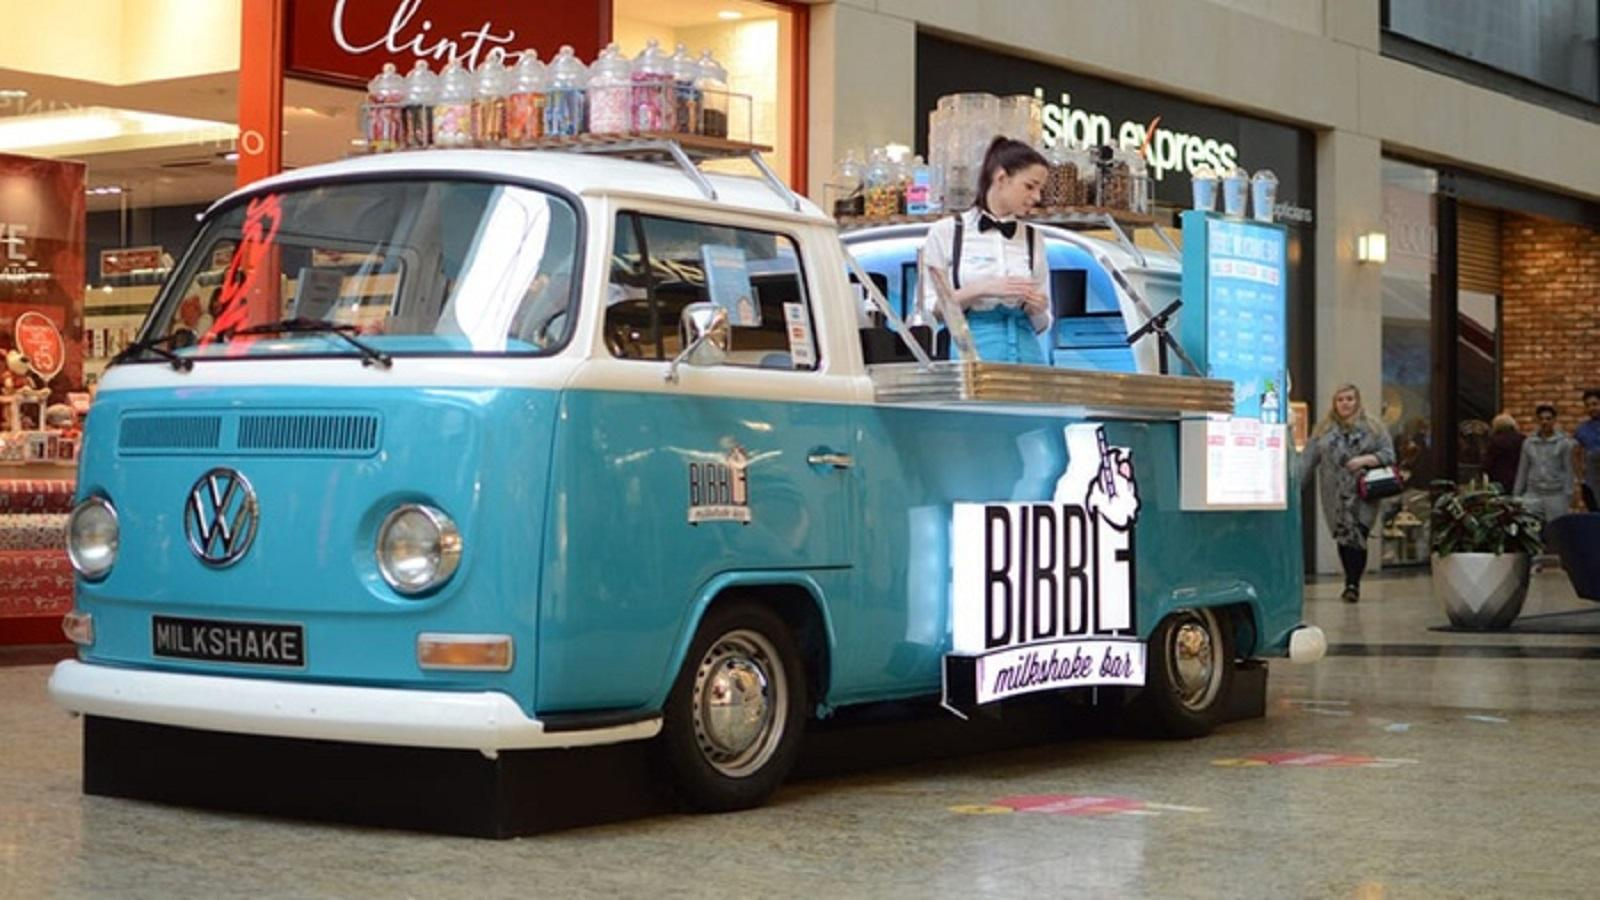 Bibble Bar- Milton Keynes Shopping Centre